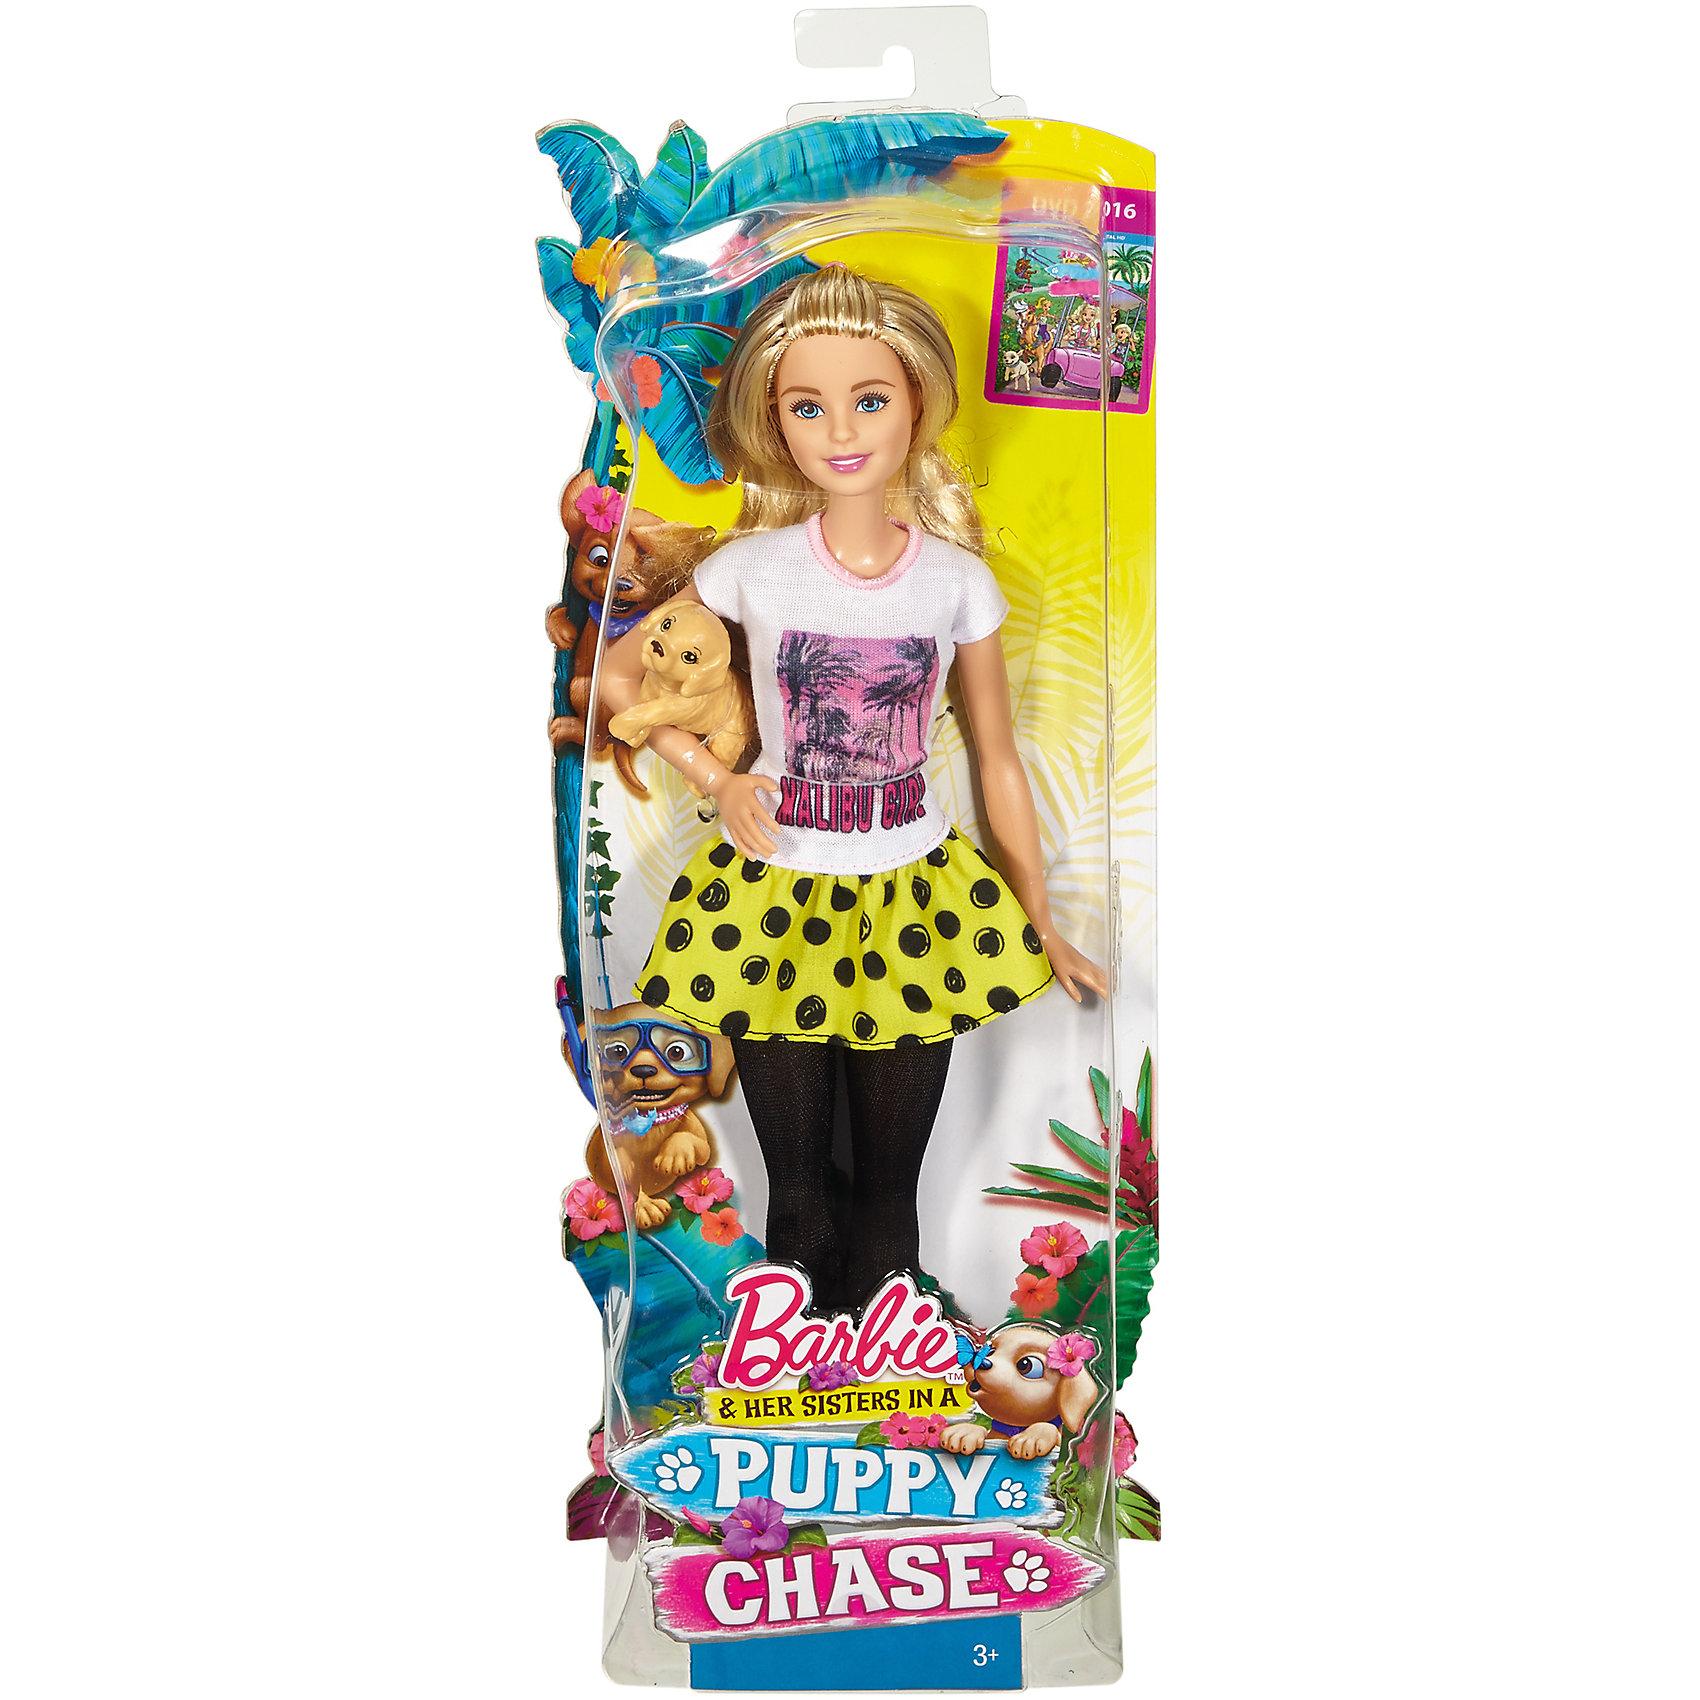 Кукла-сестра Barbie со щенками, BarbieBarbie<br><br><br>Ширина мм: 328<br>Глубина мм: 129<br>Высота мм: 53<br>Вес г: 189<br>Возраст от месяцев: 36<br>Возраст до месяцев: 72<br>Пол: Женский<br>Возраст: Детский<br>SKU: 5440245